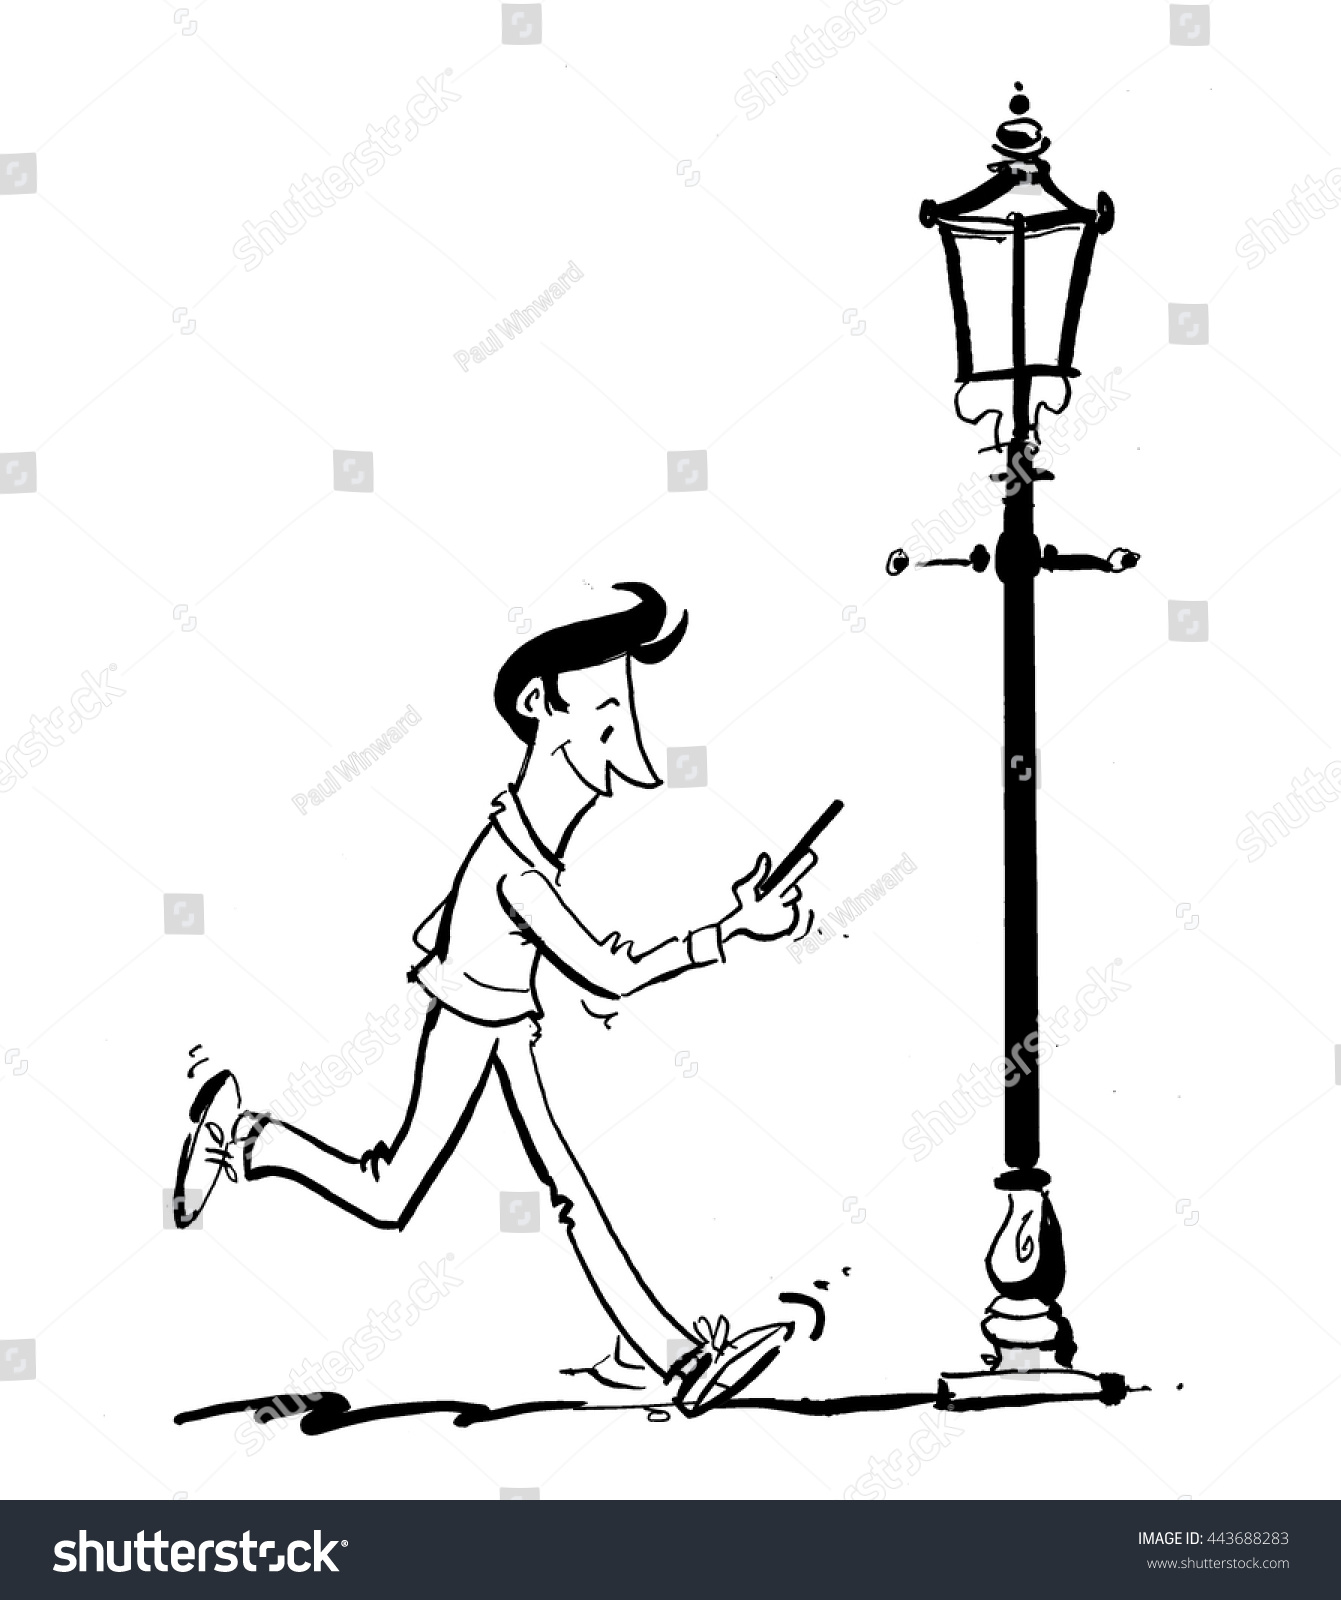 Cartoon Line Drawing Man On Phone Stock Vector 443688283 ...